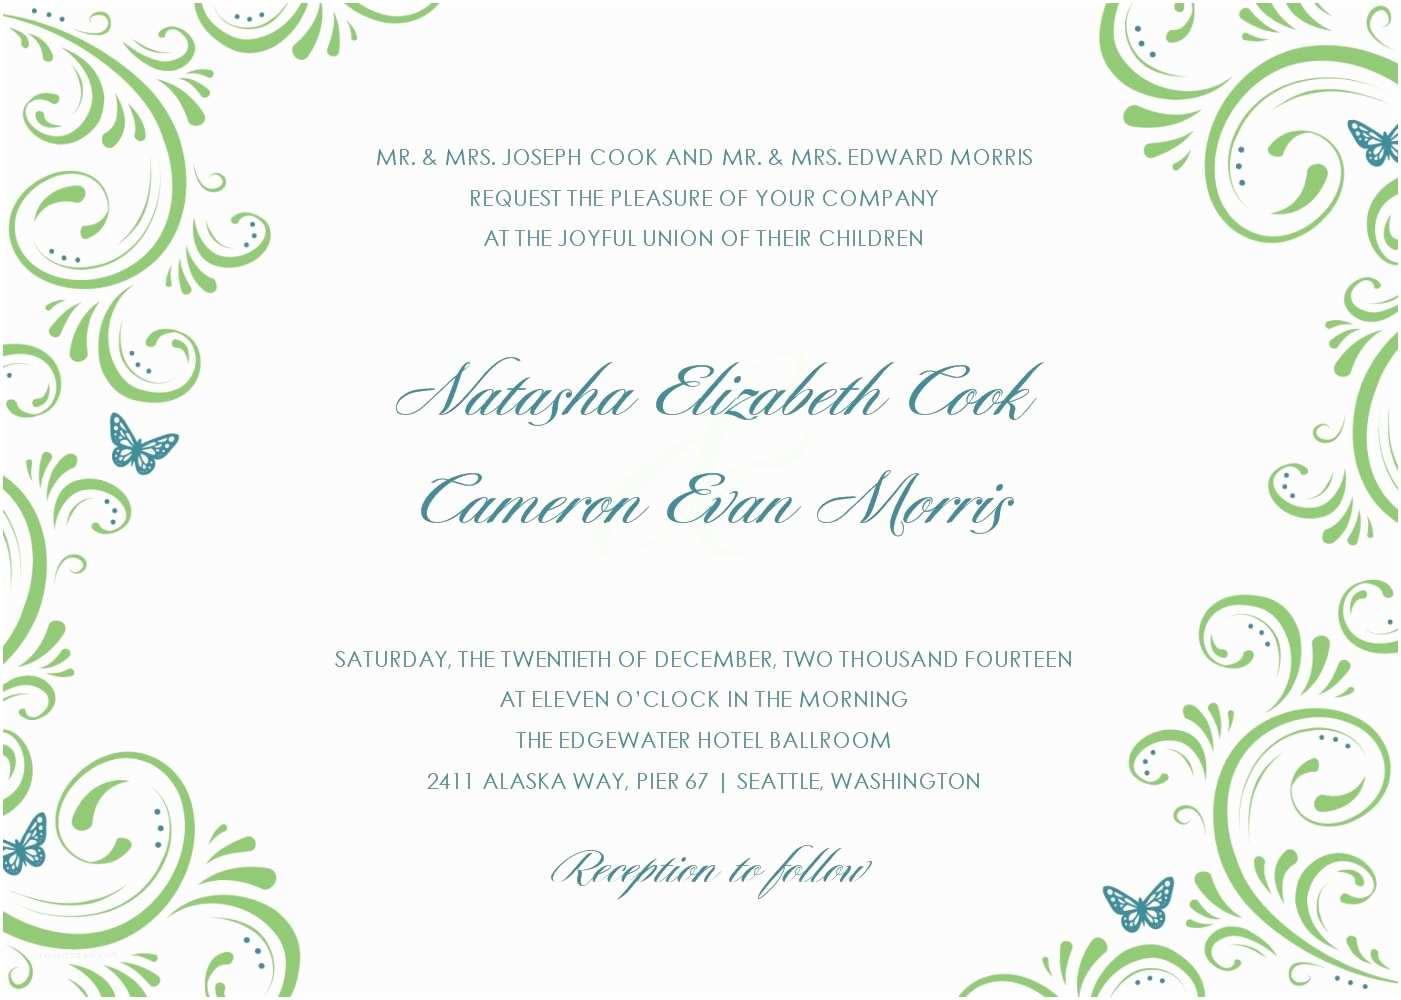 Wedding Invitation Designs Beautiful Wedding Invitation Templates